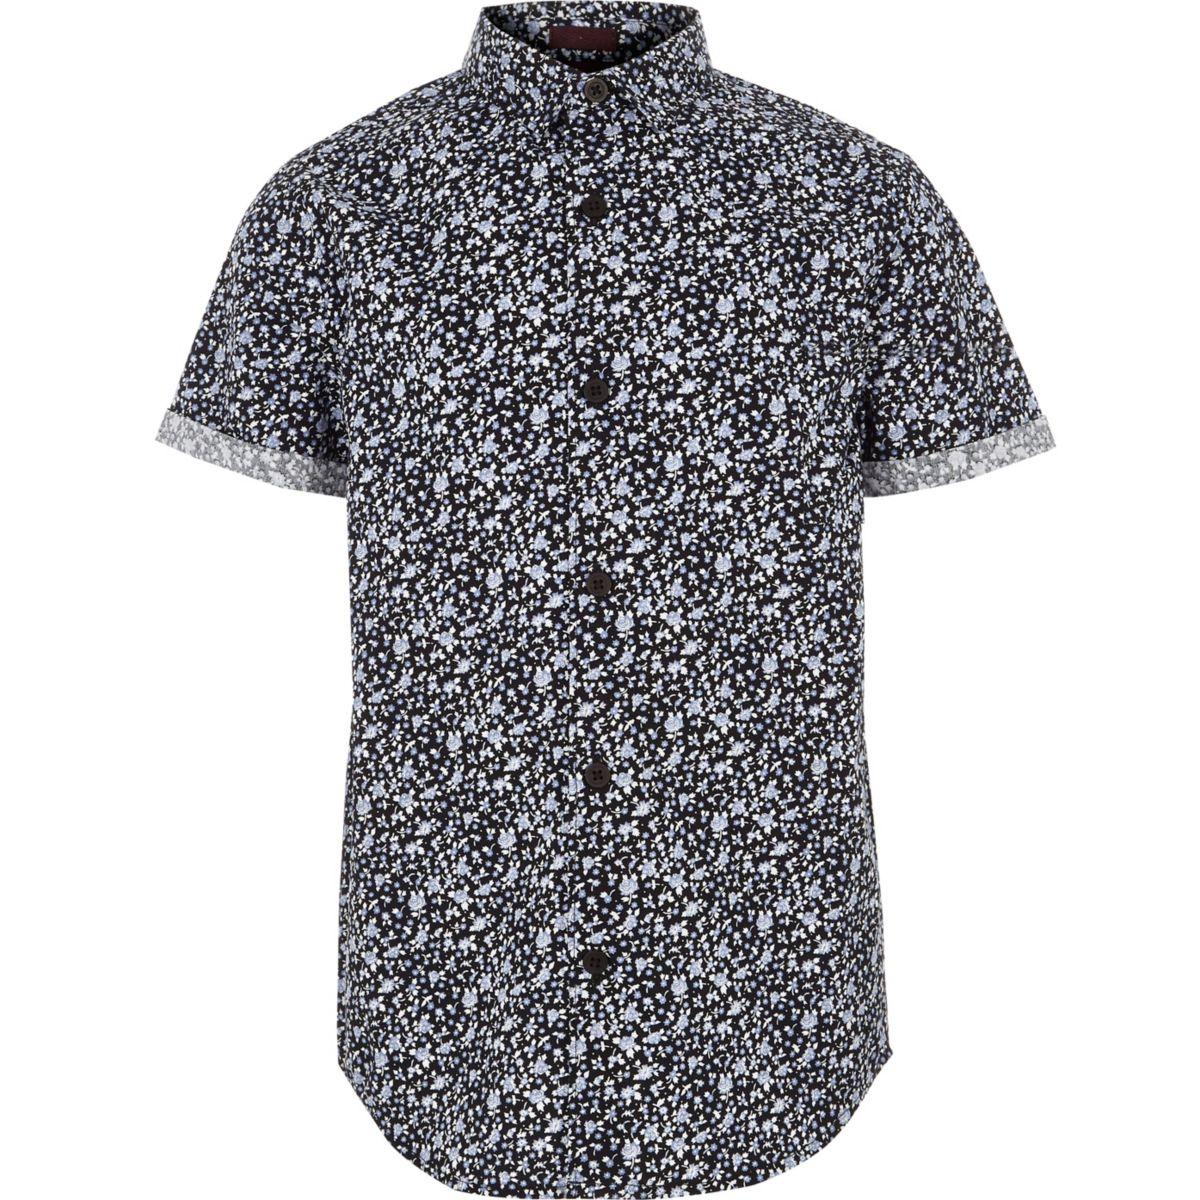 Boys blue ditsy floral short sleeve shirt